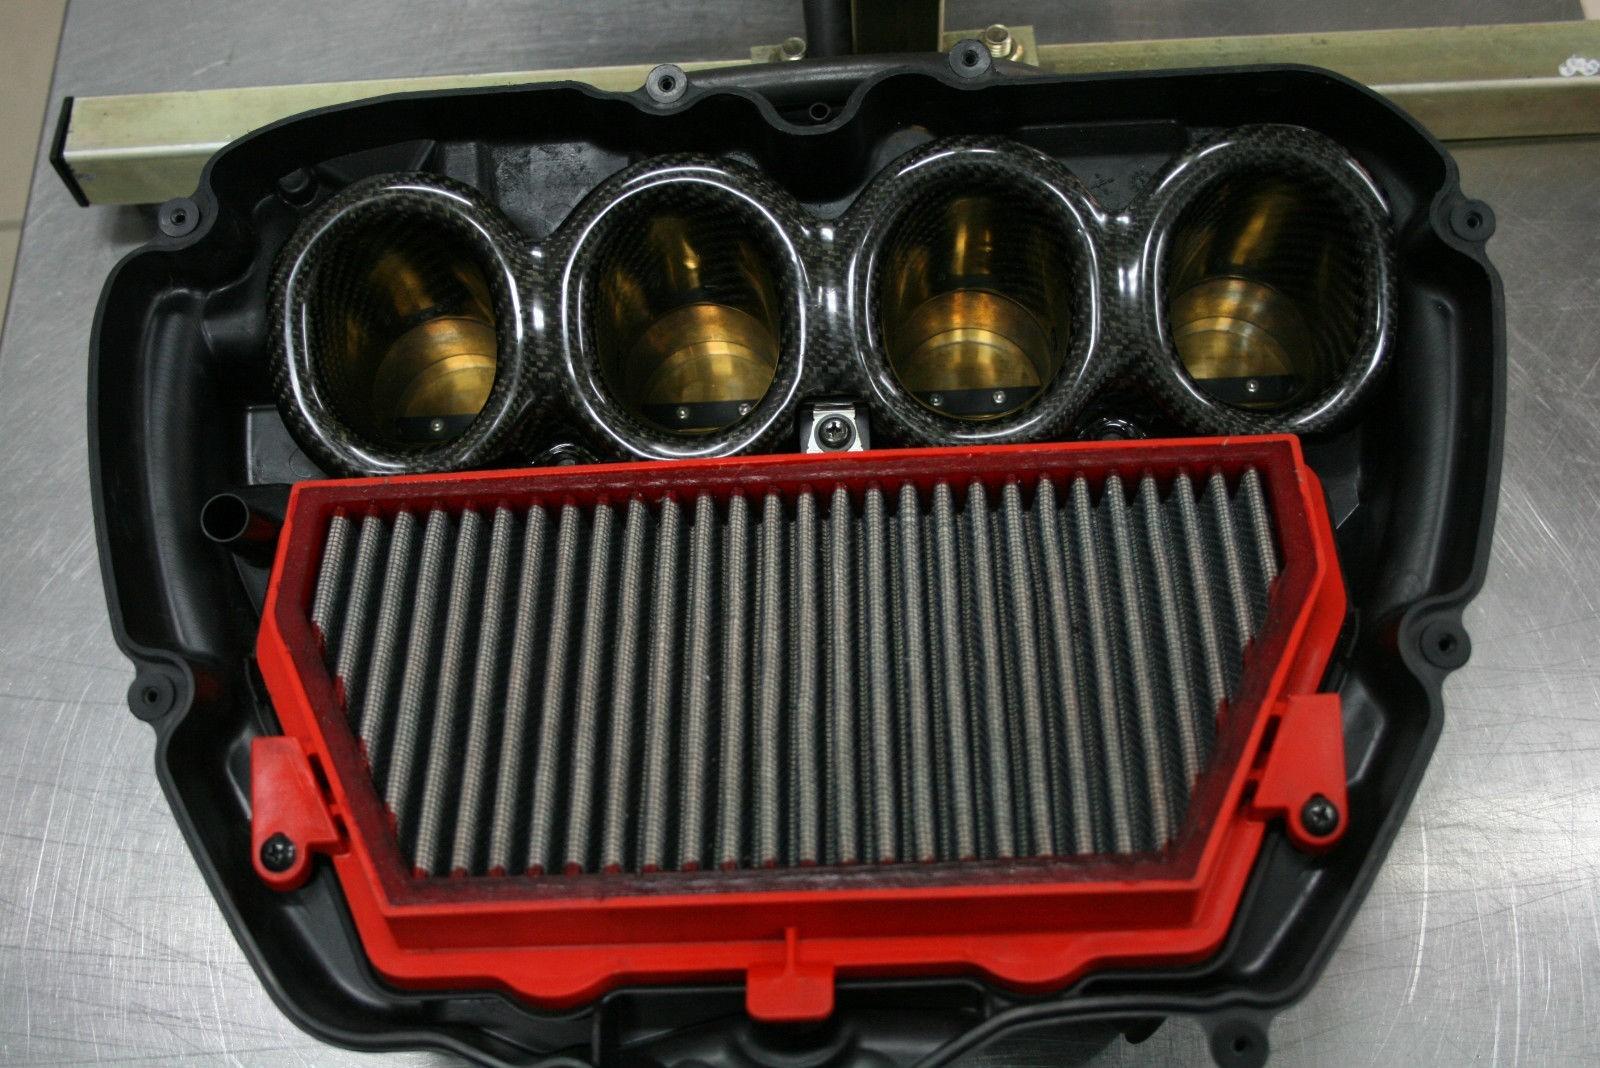 2008-16 Honda CBR1000RR Carbon Fiber Velocity Stack / Bellmouth Kit - MotoMaxx